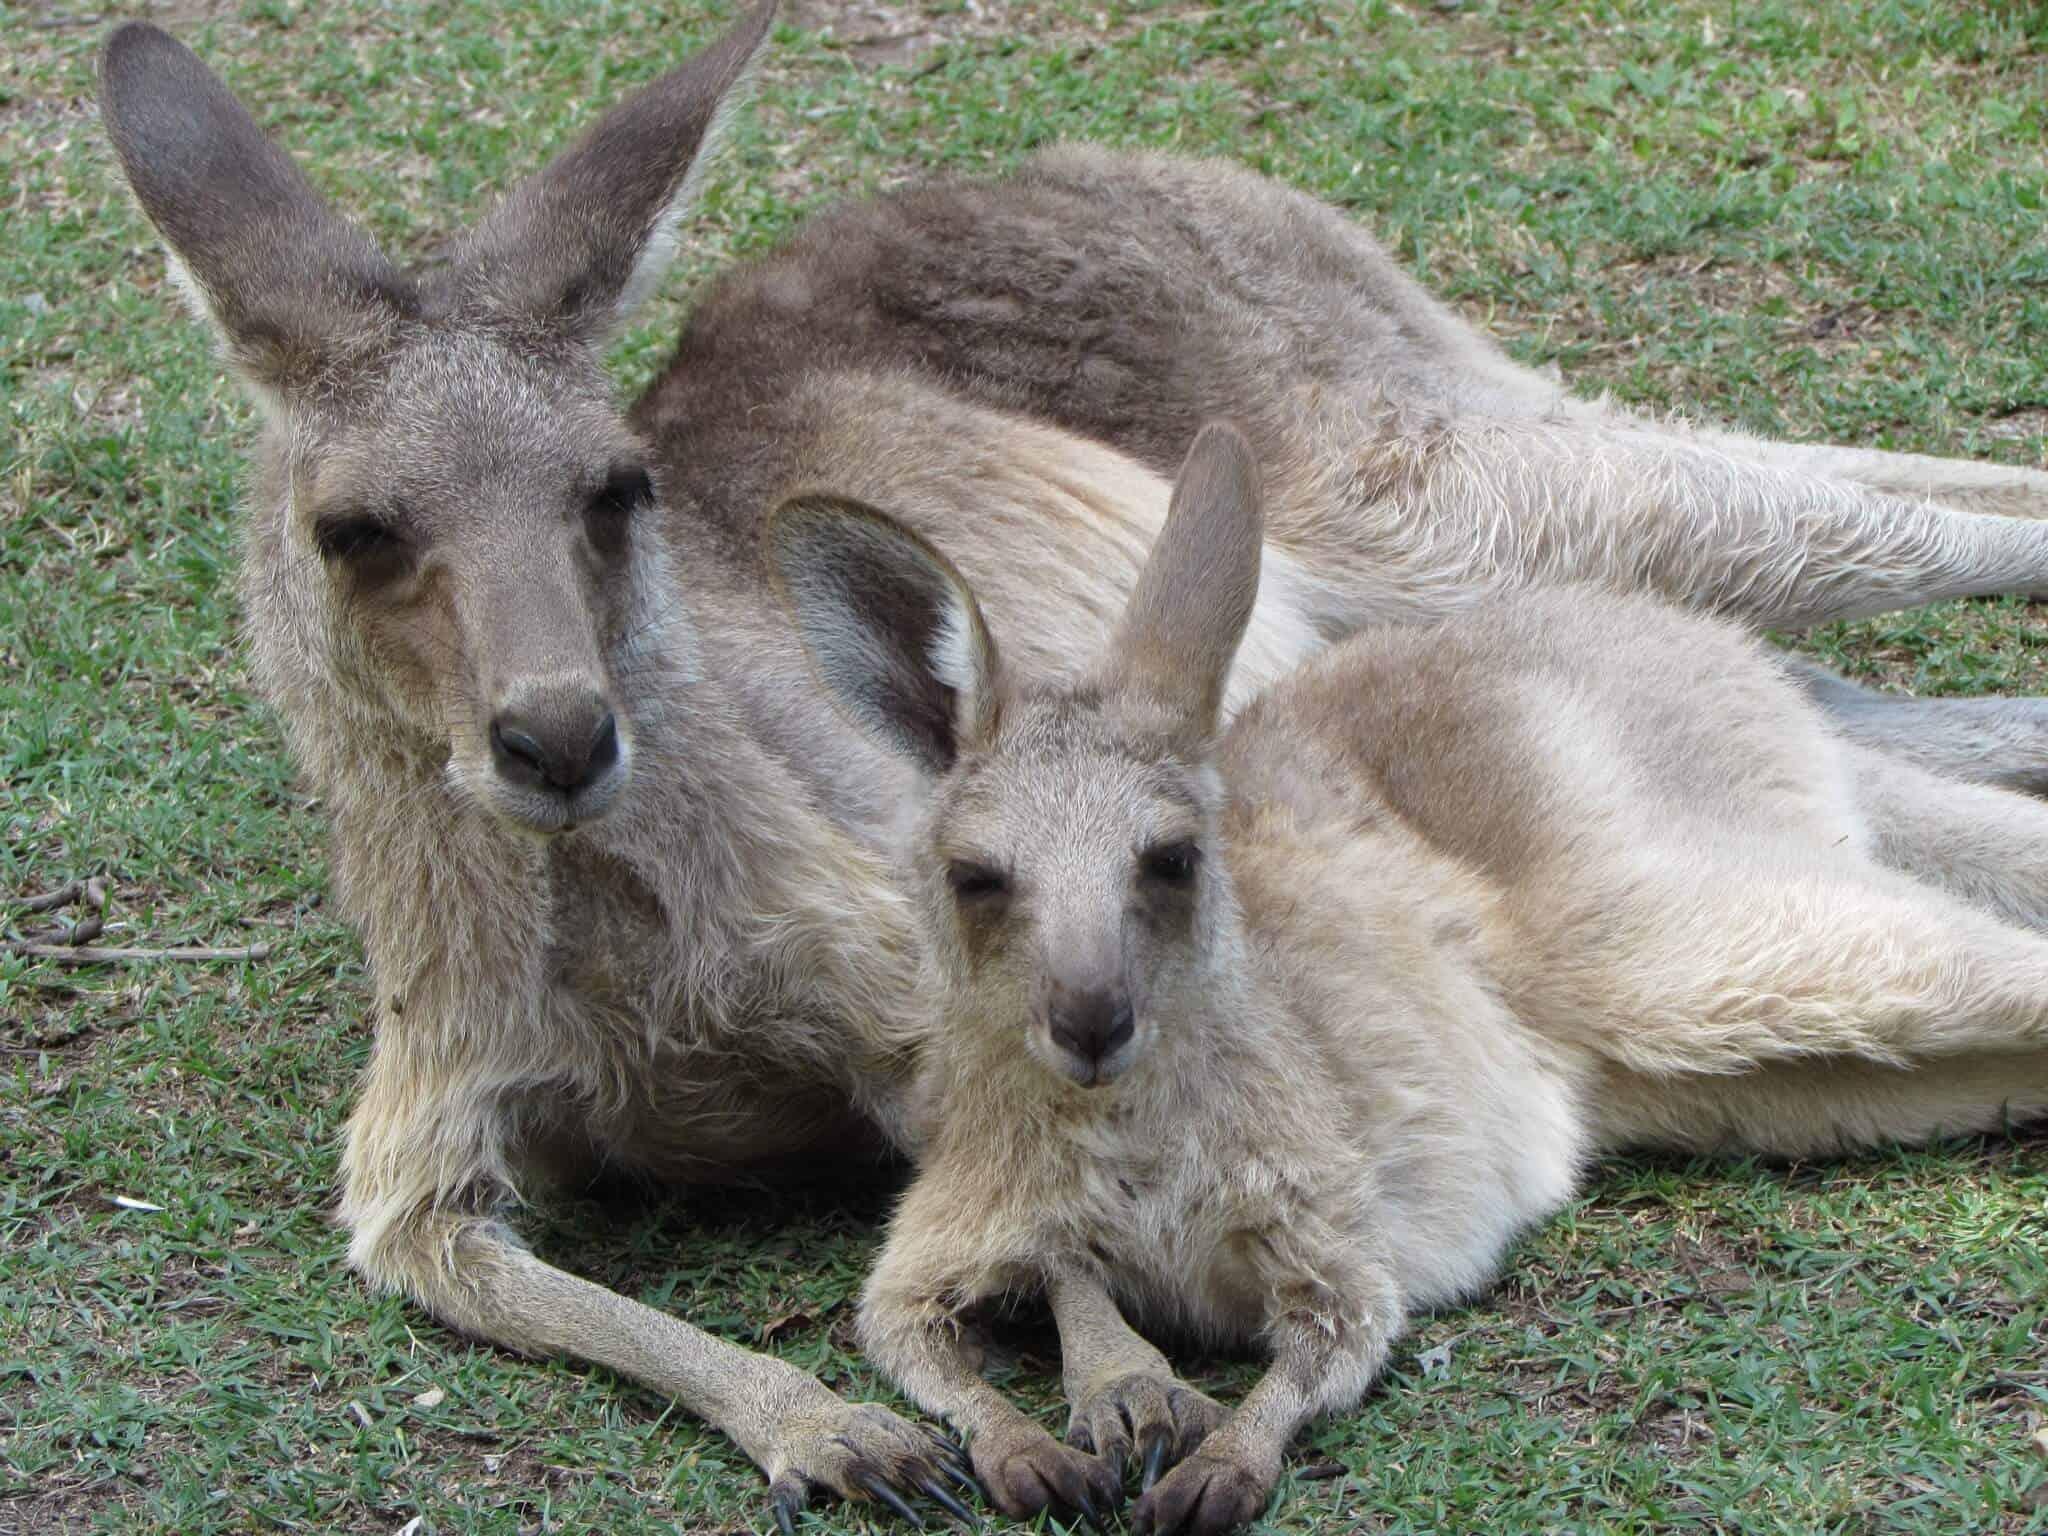 Volunteering at a Kangaroo Sanctuary via @greenglobaltrvl